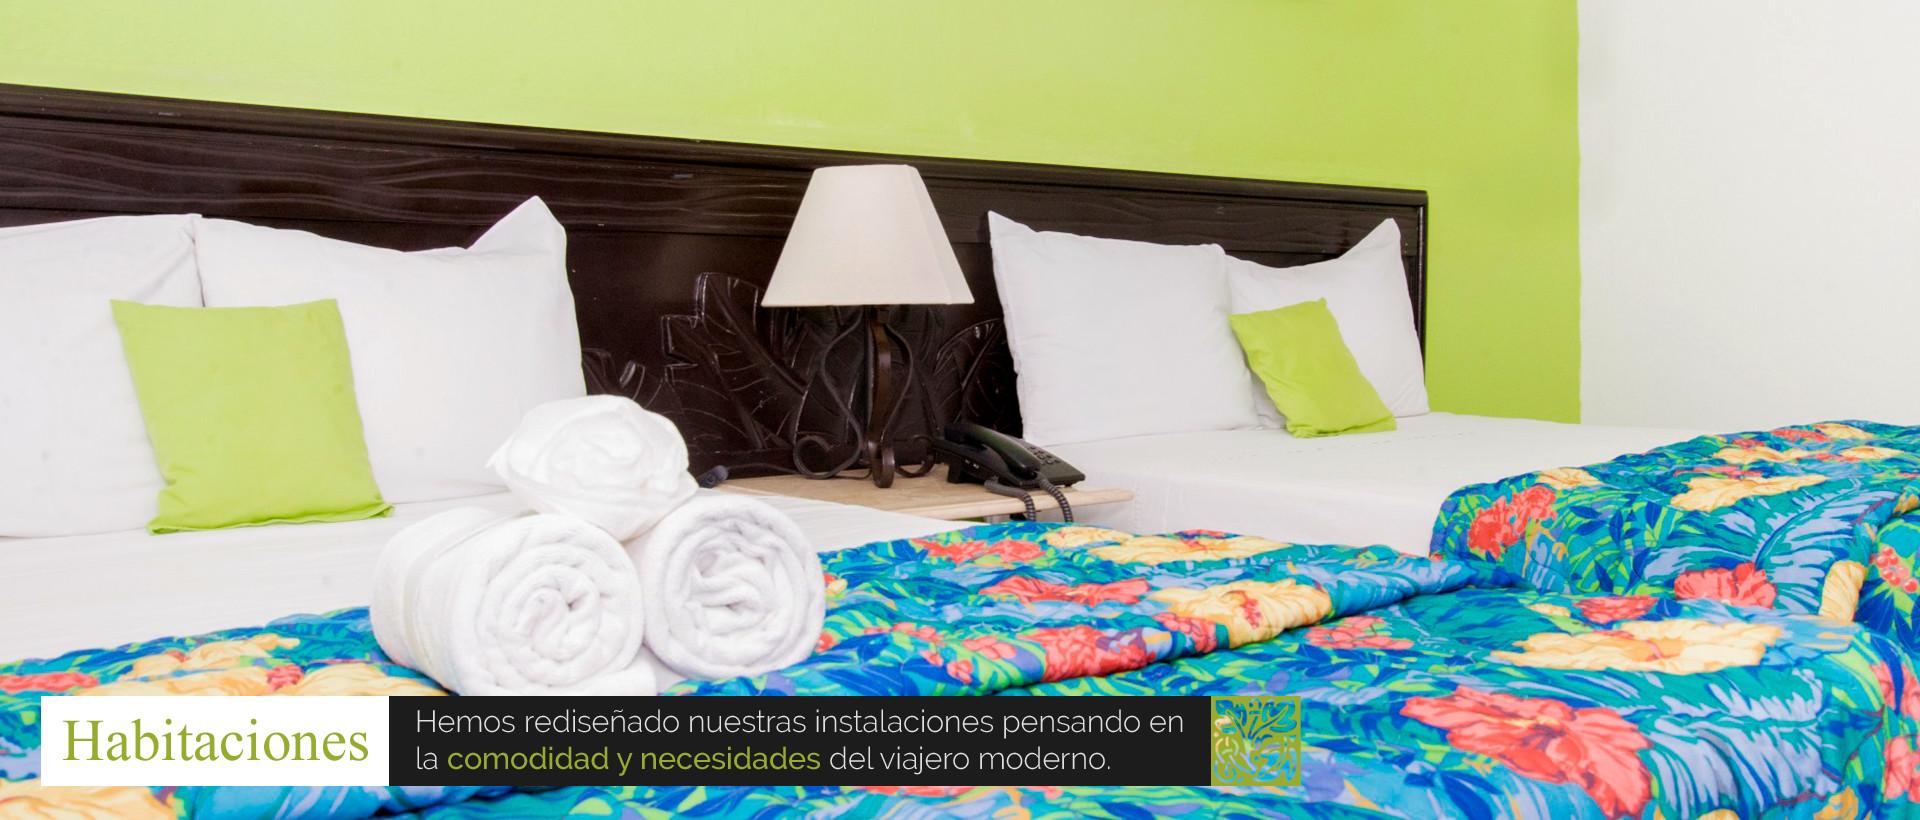 Hotel El Cid Merida